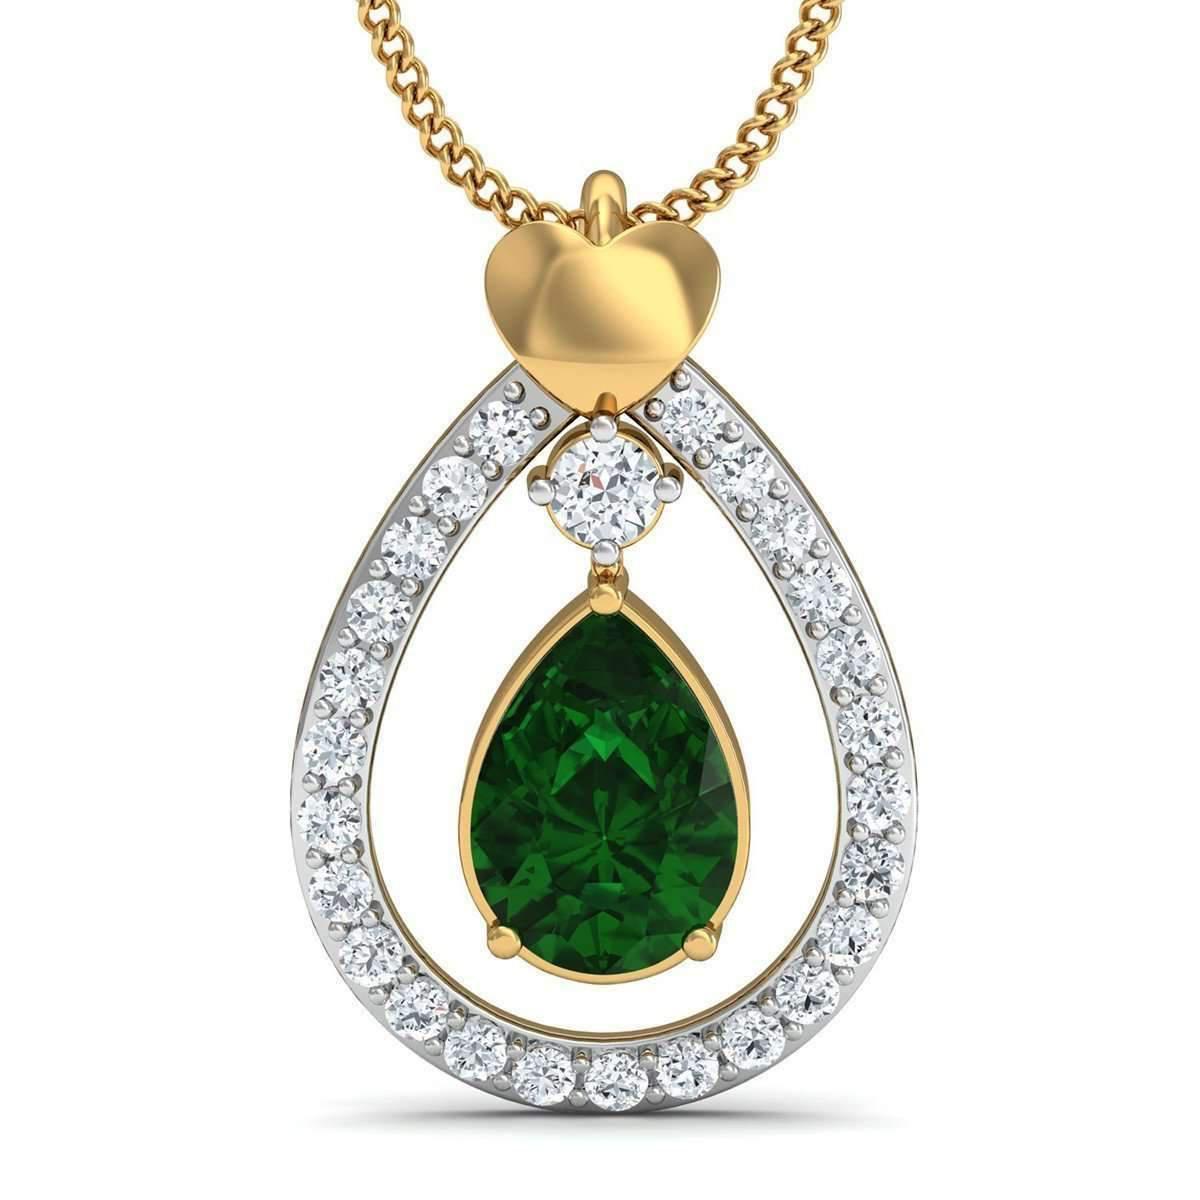 Diamoire Jewels Brazilian Emerald Cut Emerald and Diamond Pendant Handmade in 14kt Yellow Gold RtQtlxGqGe